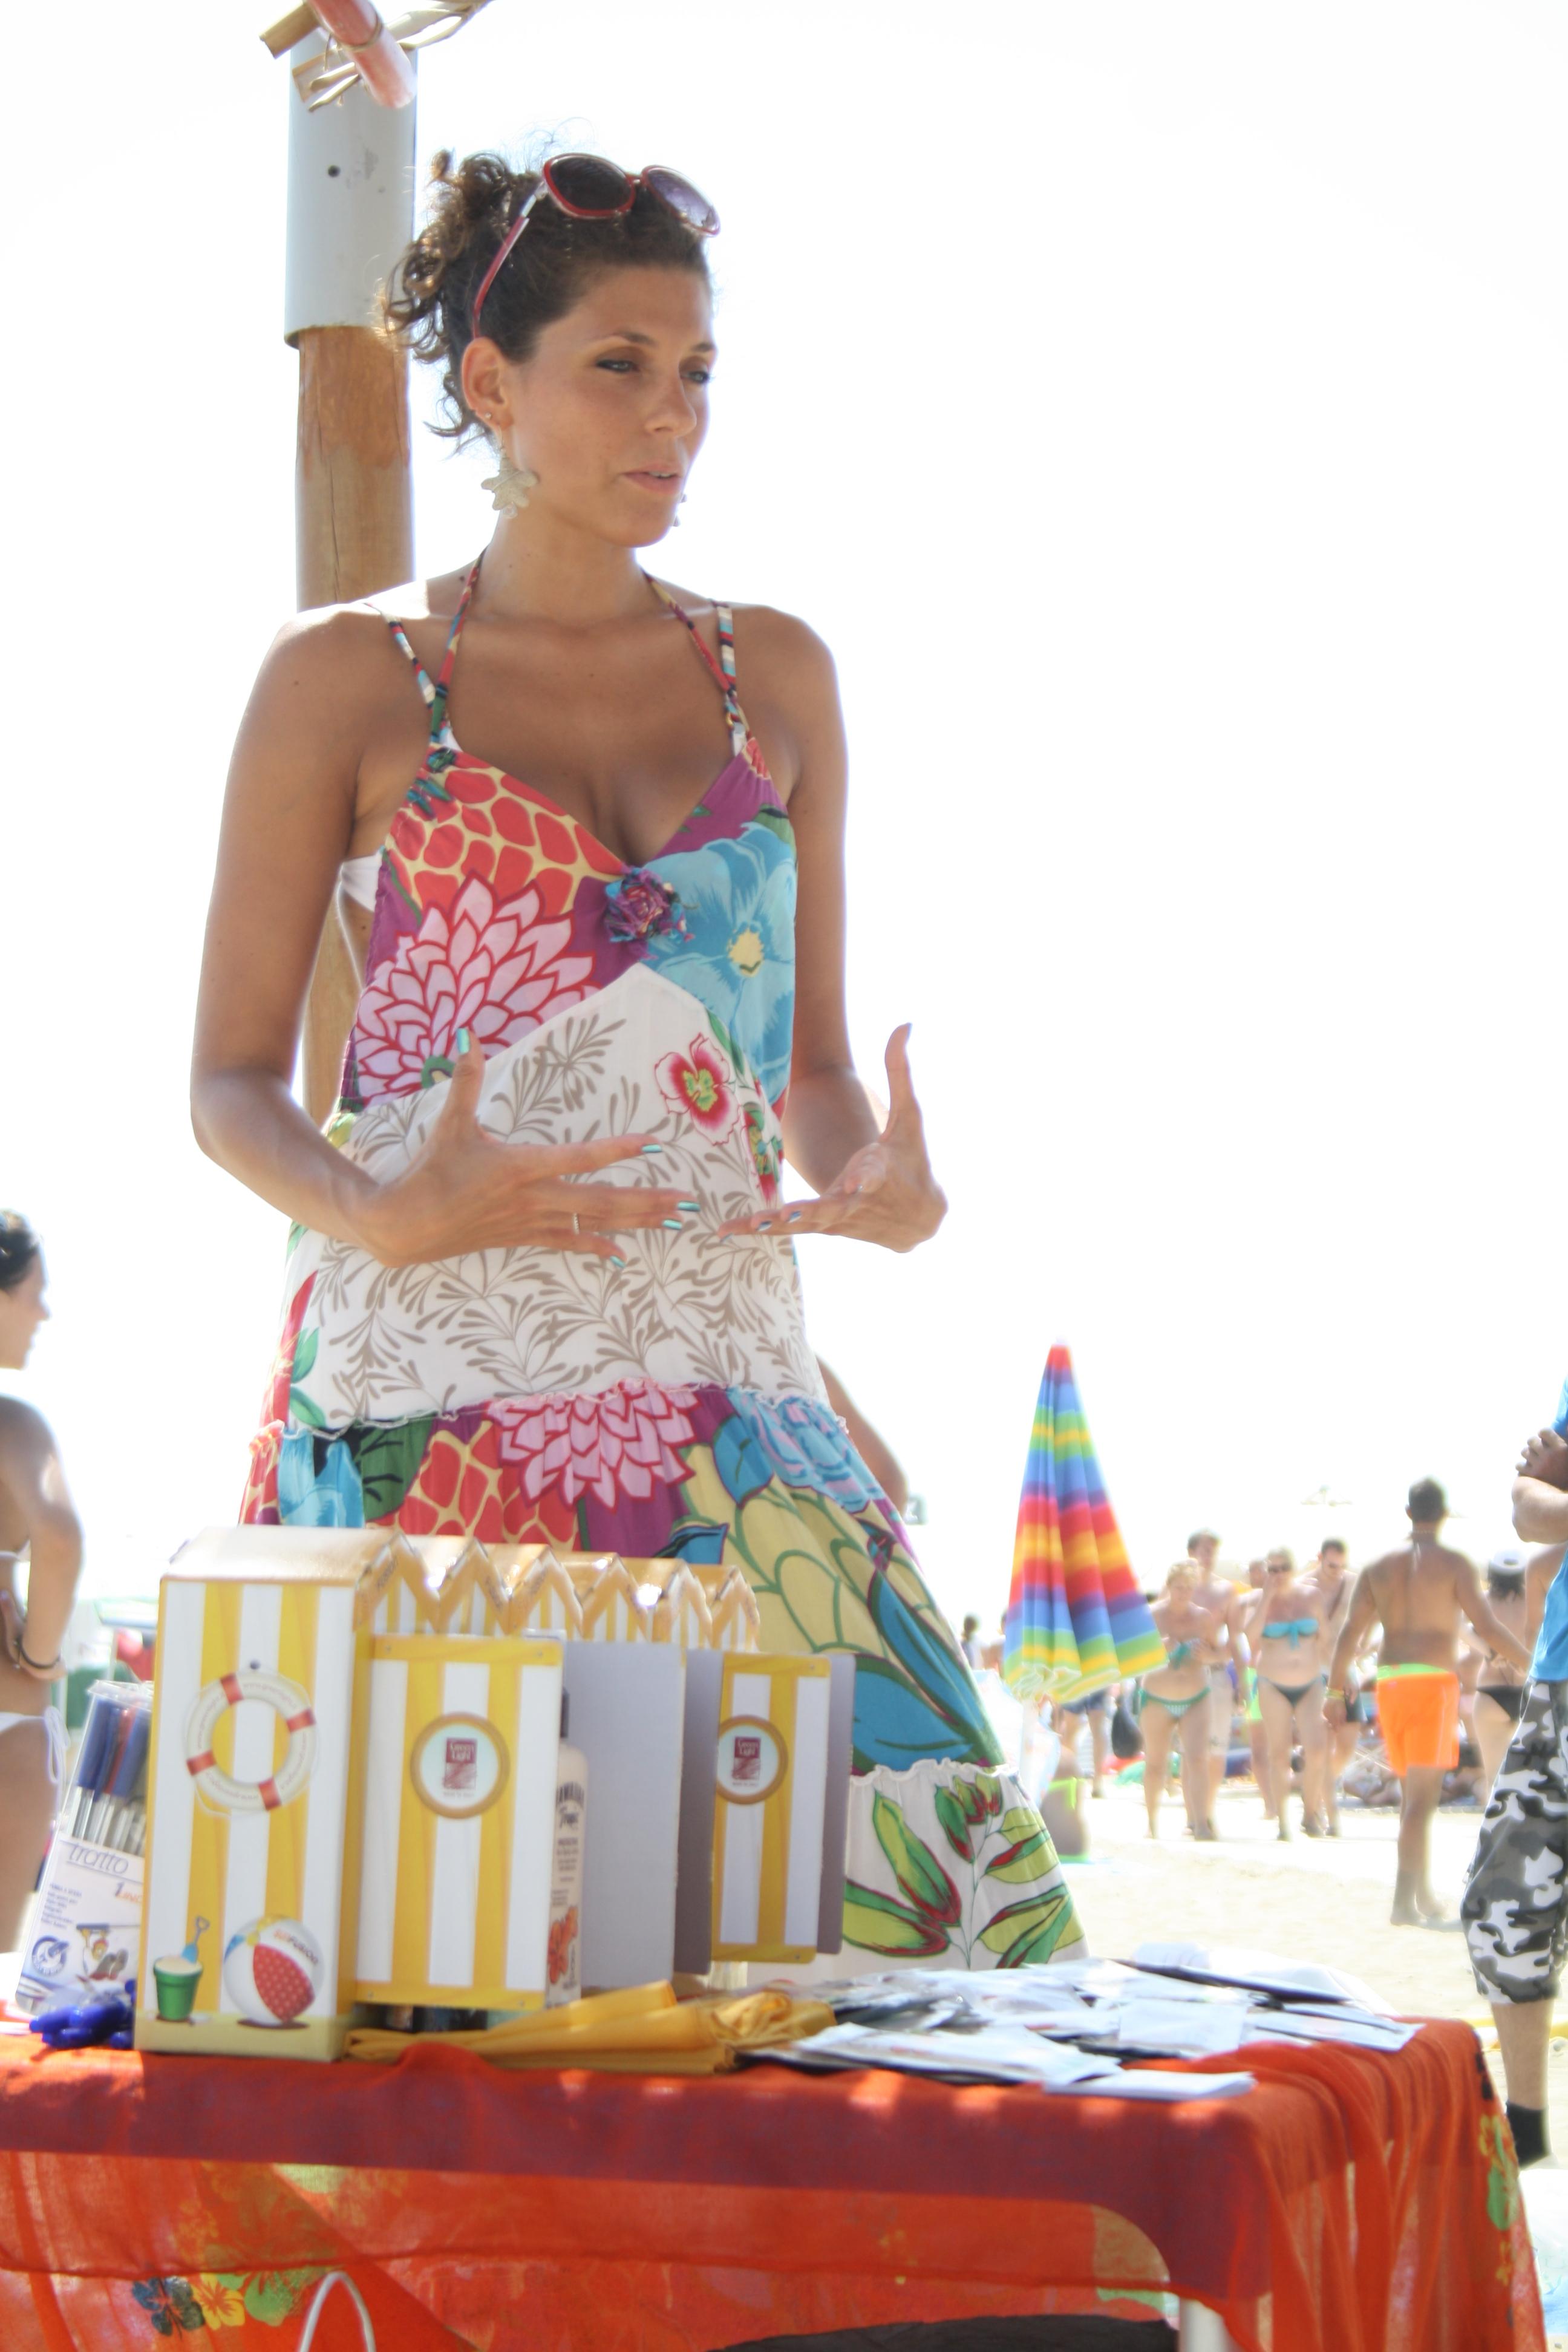 Summertime con l'Esteta - Lido di Camaiore beach free.